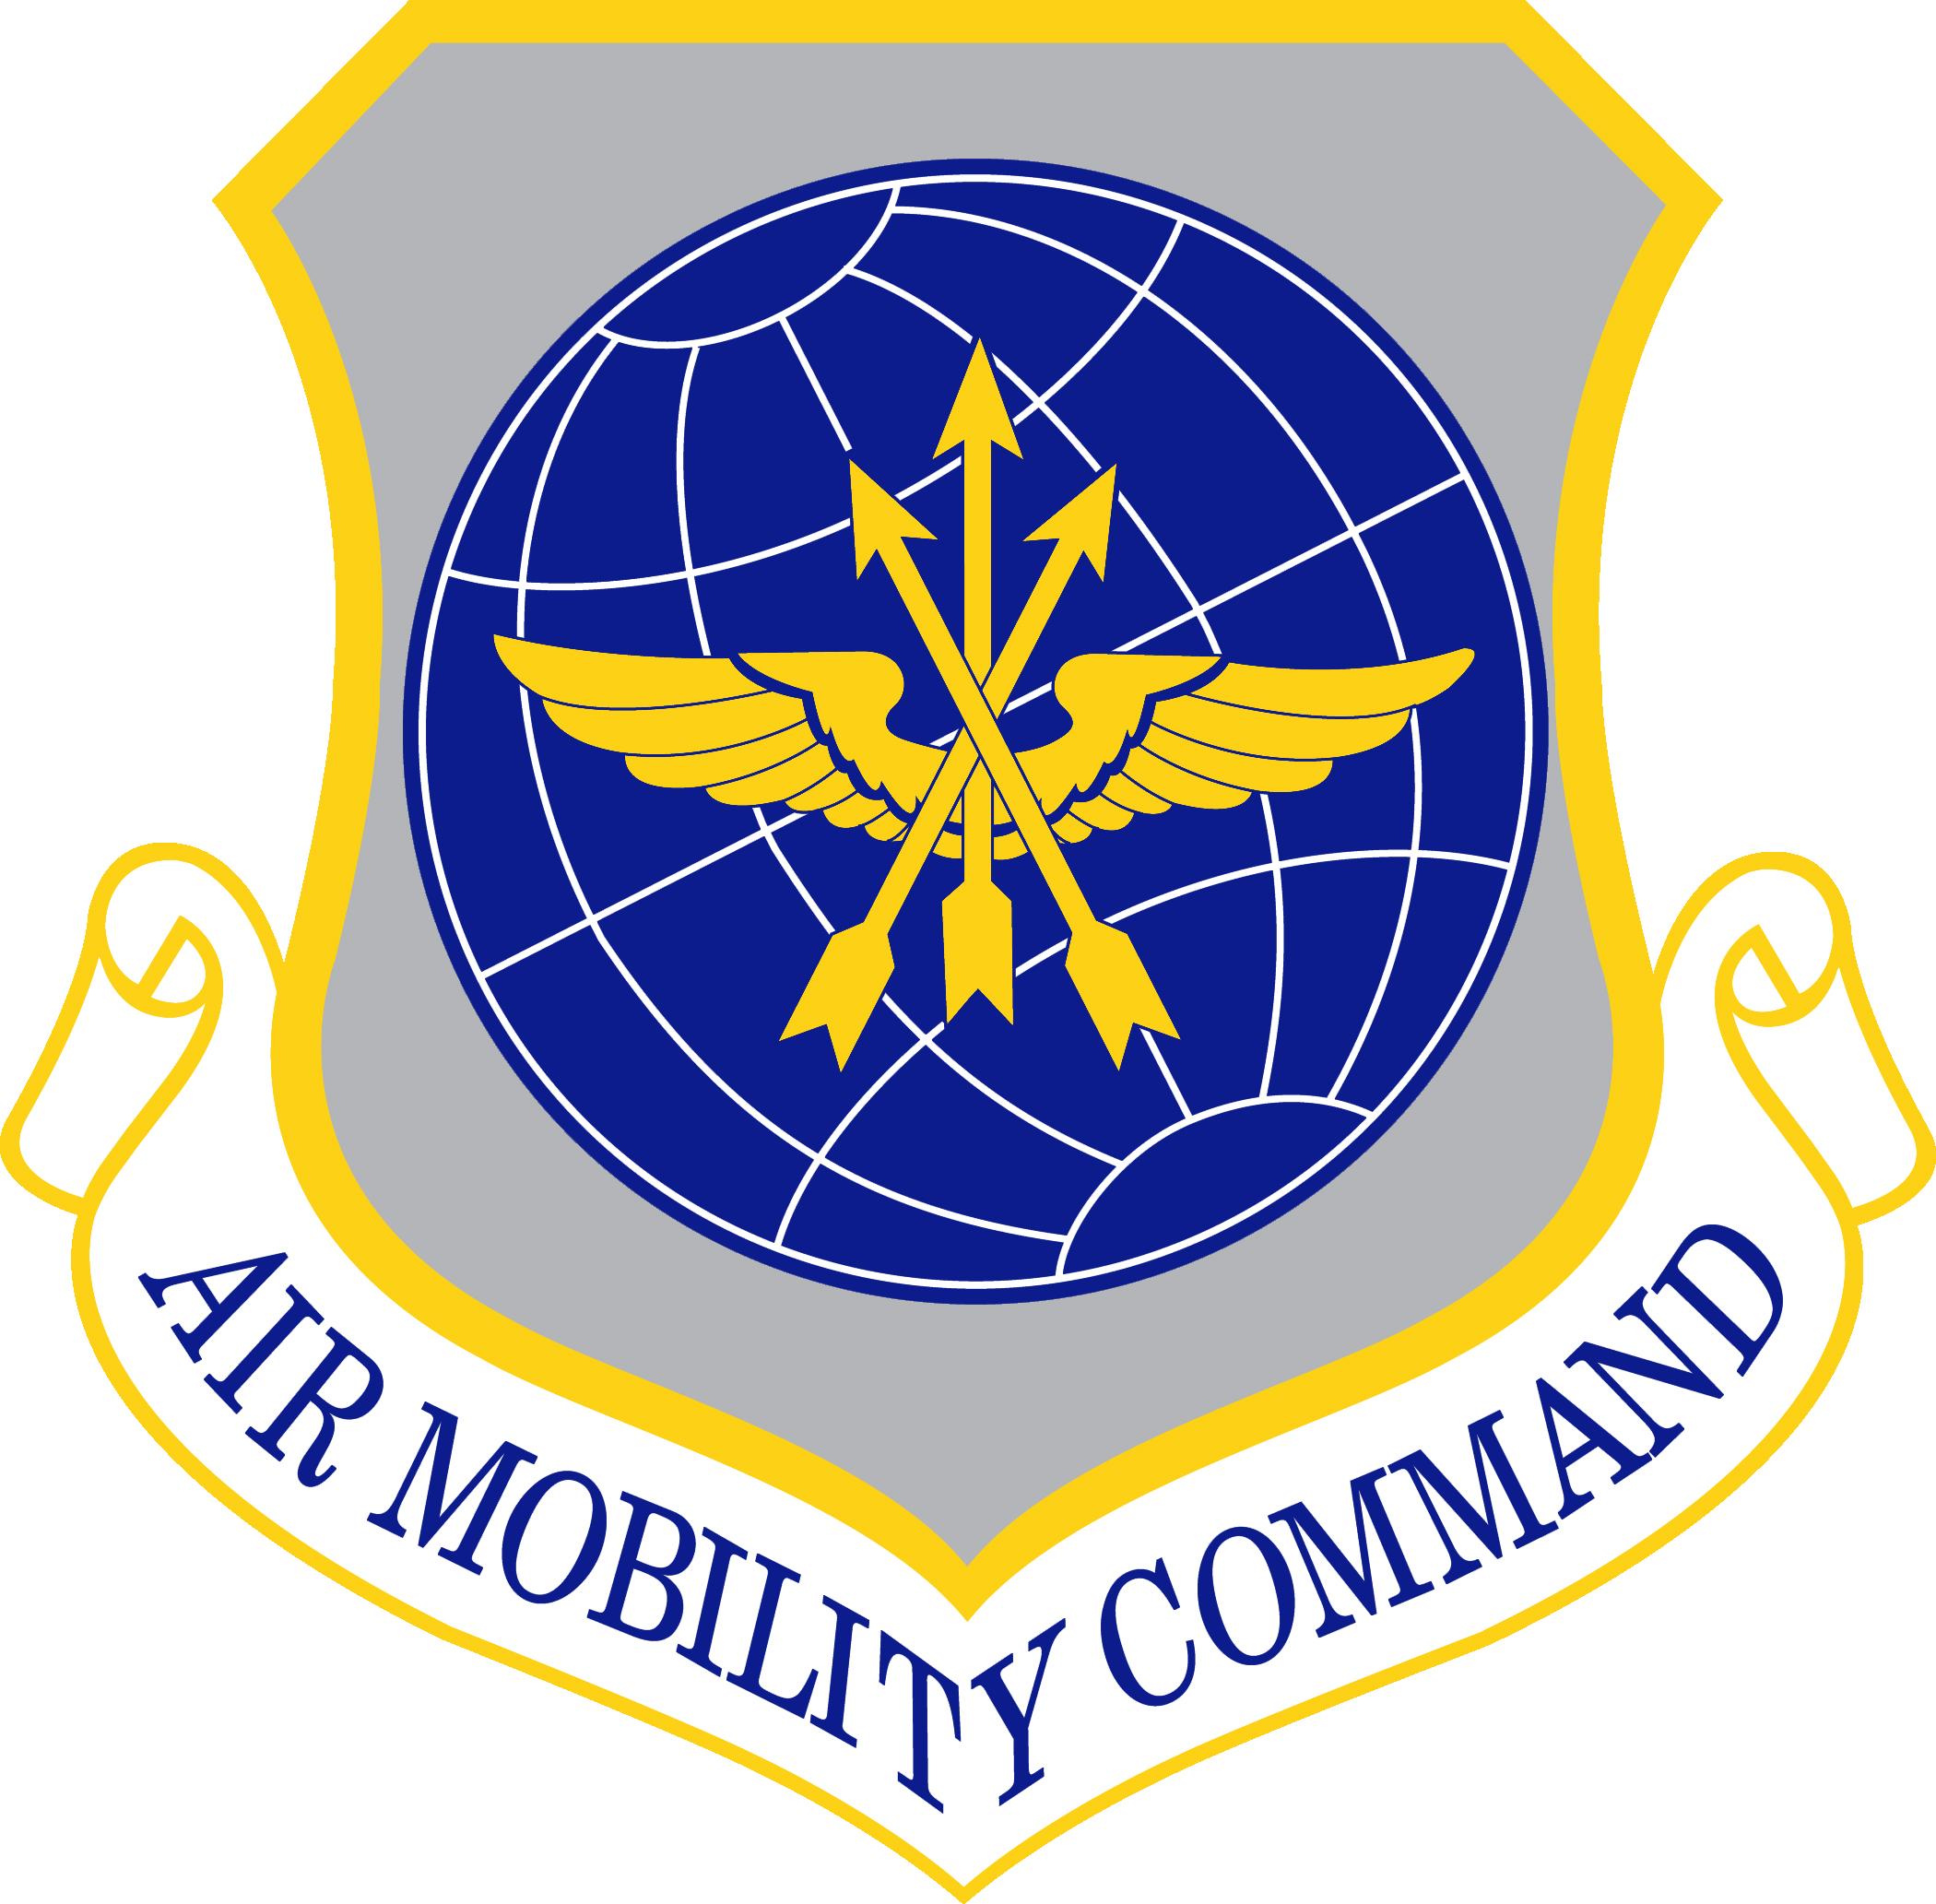 2010 AMC Judge Advocate General Corps Award Winners Announced